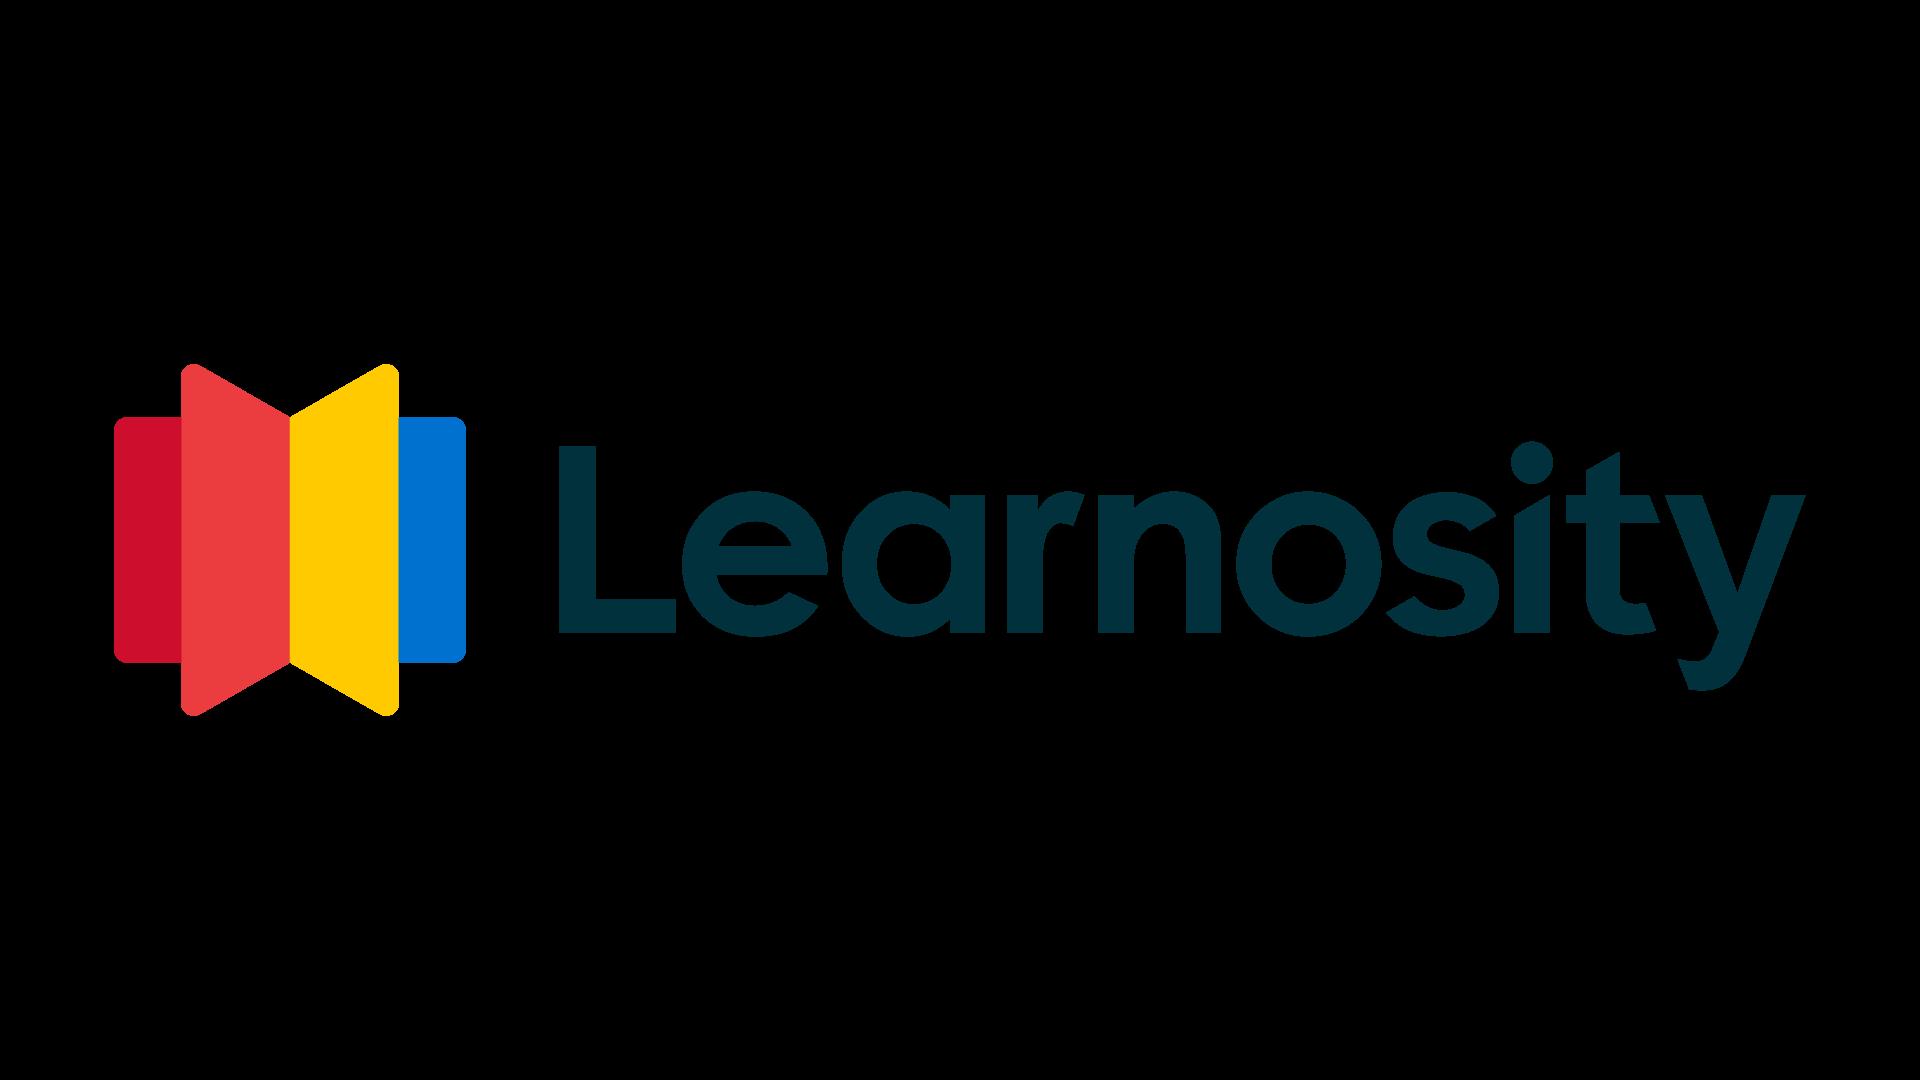 Learnosity new logo